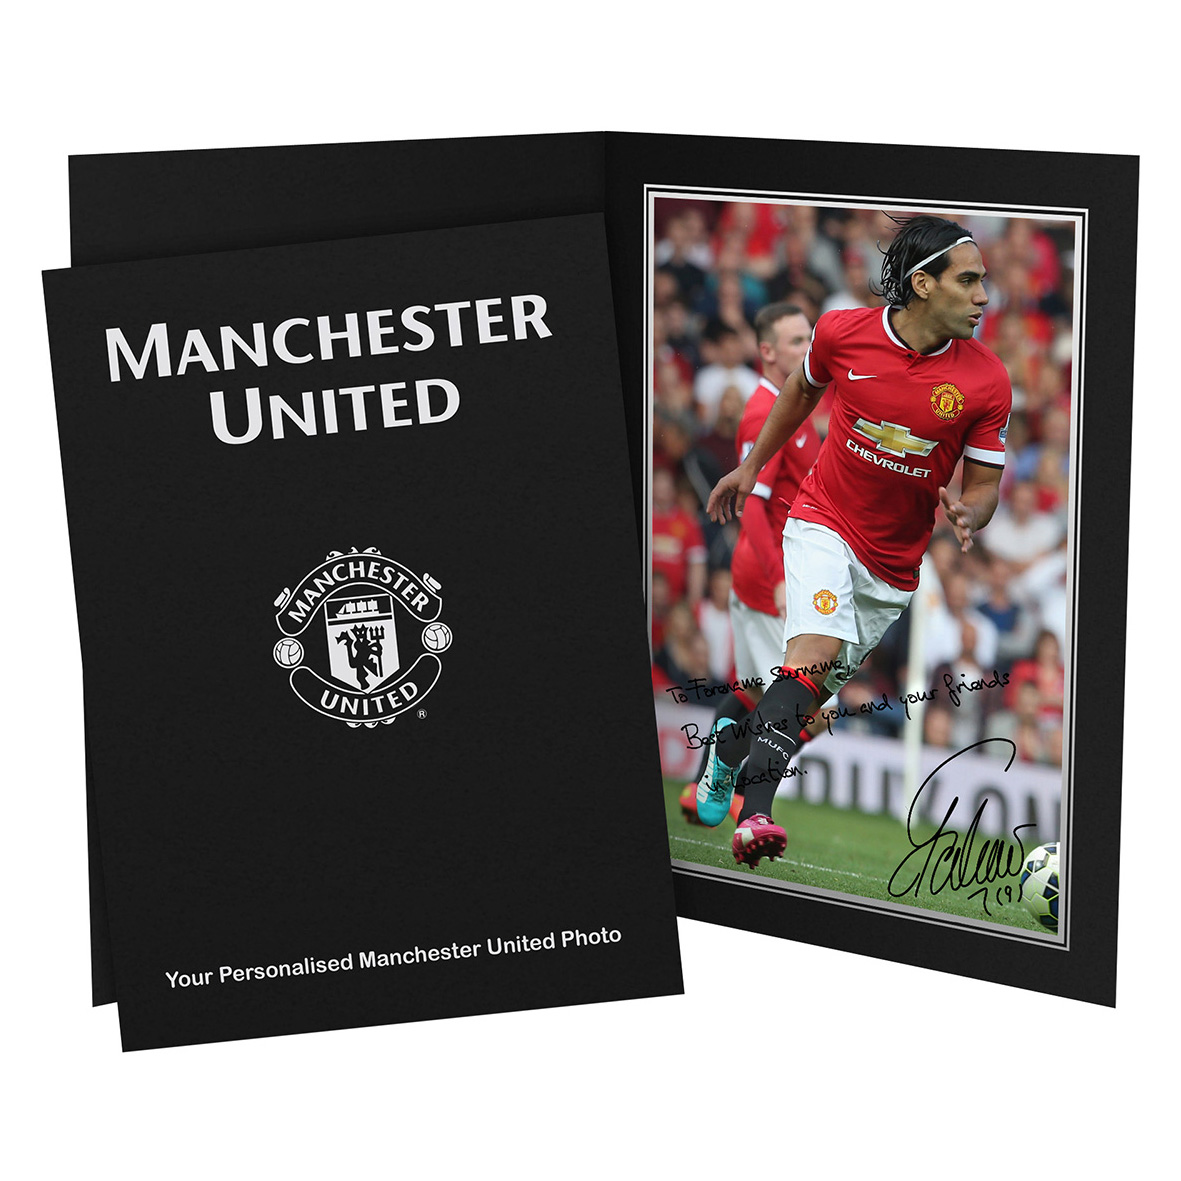 Manchester United Personalised Signature Photo in Presentation Folder - Falcao